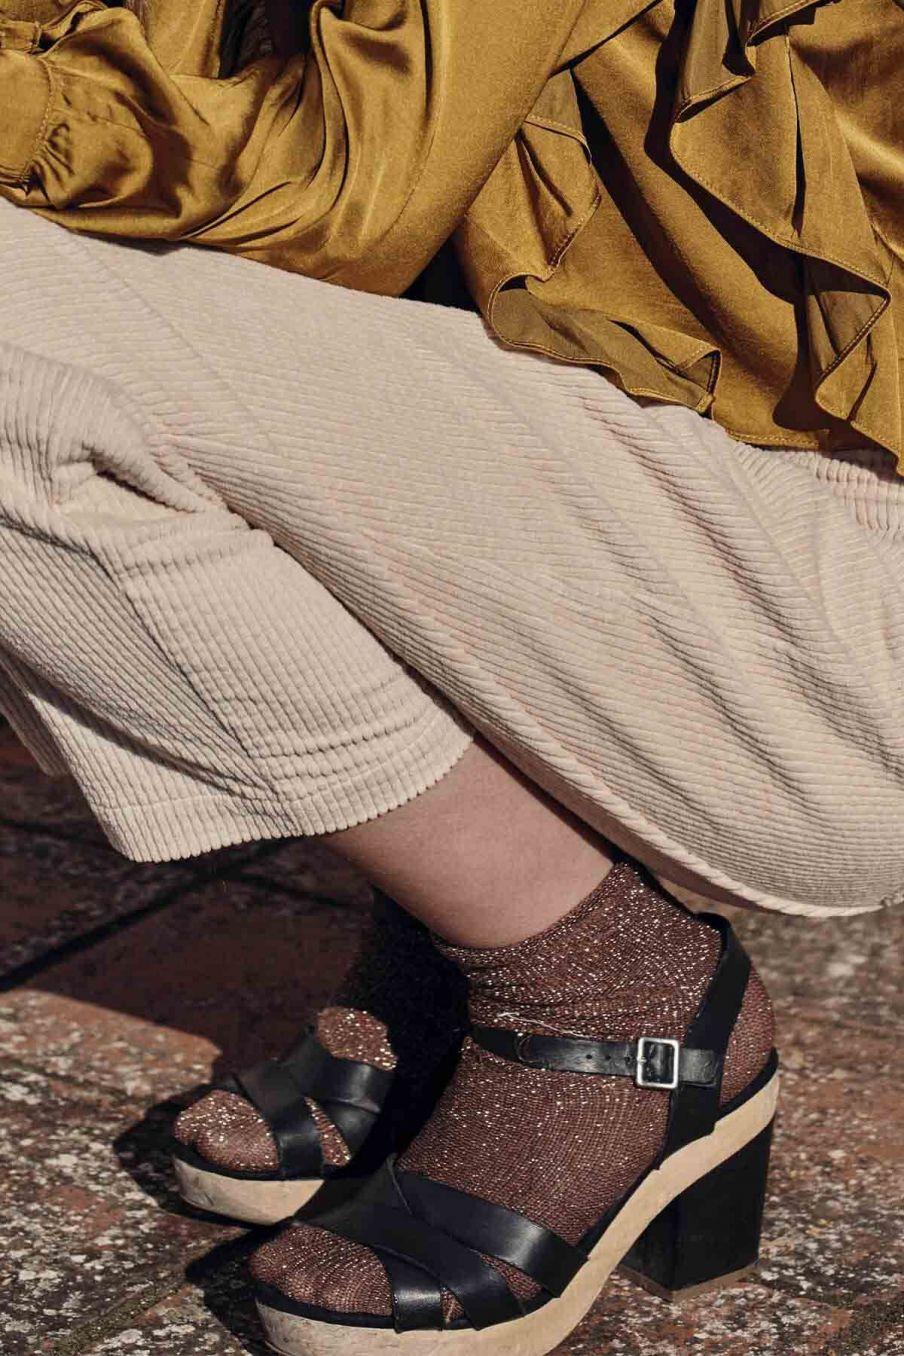 chaussettes femme louisiane sienna - louise misha